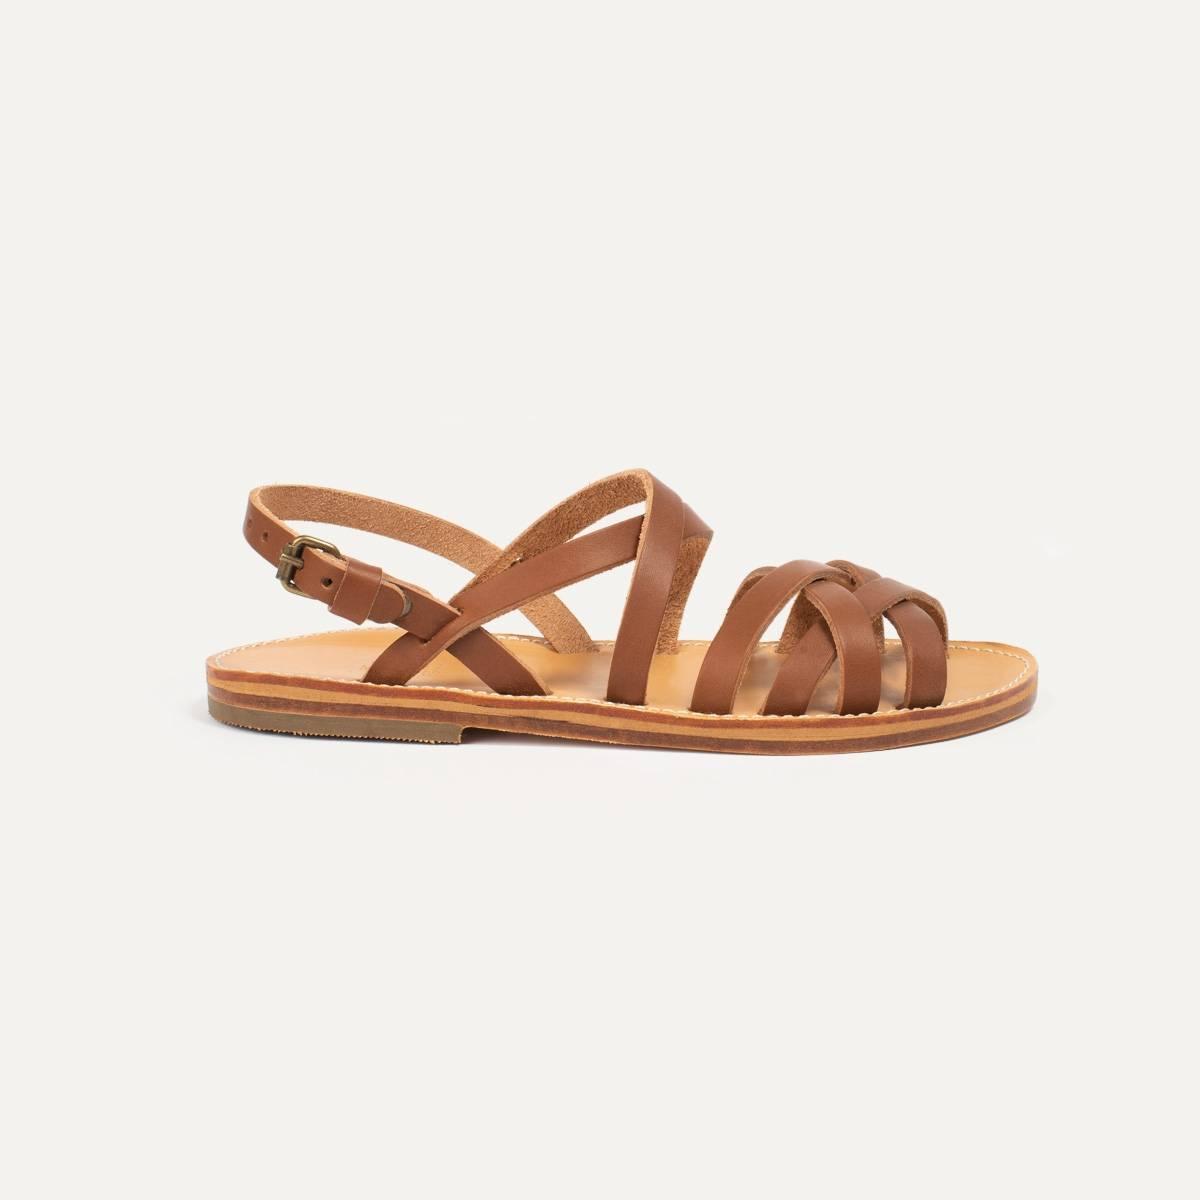 Sandales cuir Majour - Pain Brûlé (image n°5)